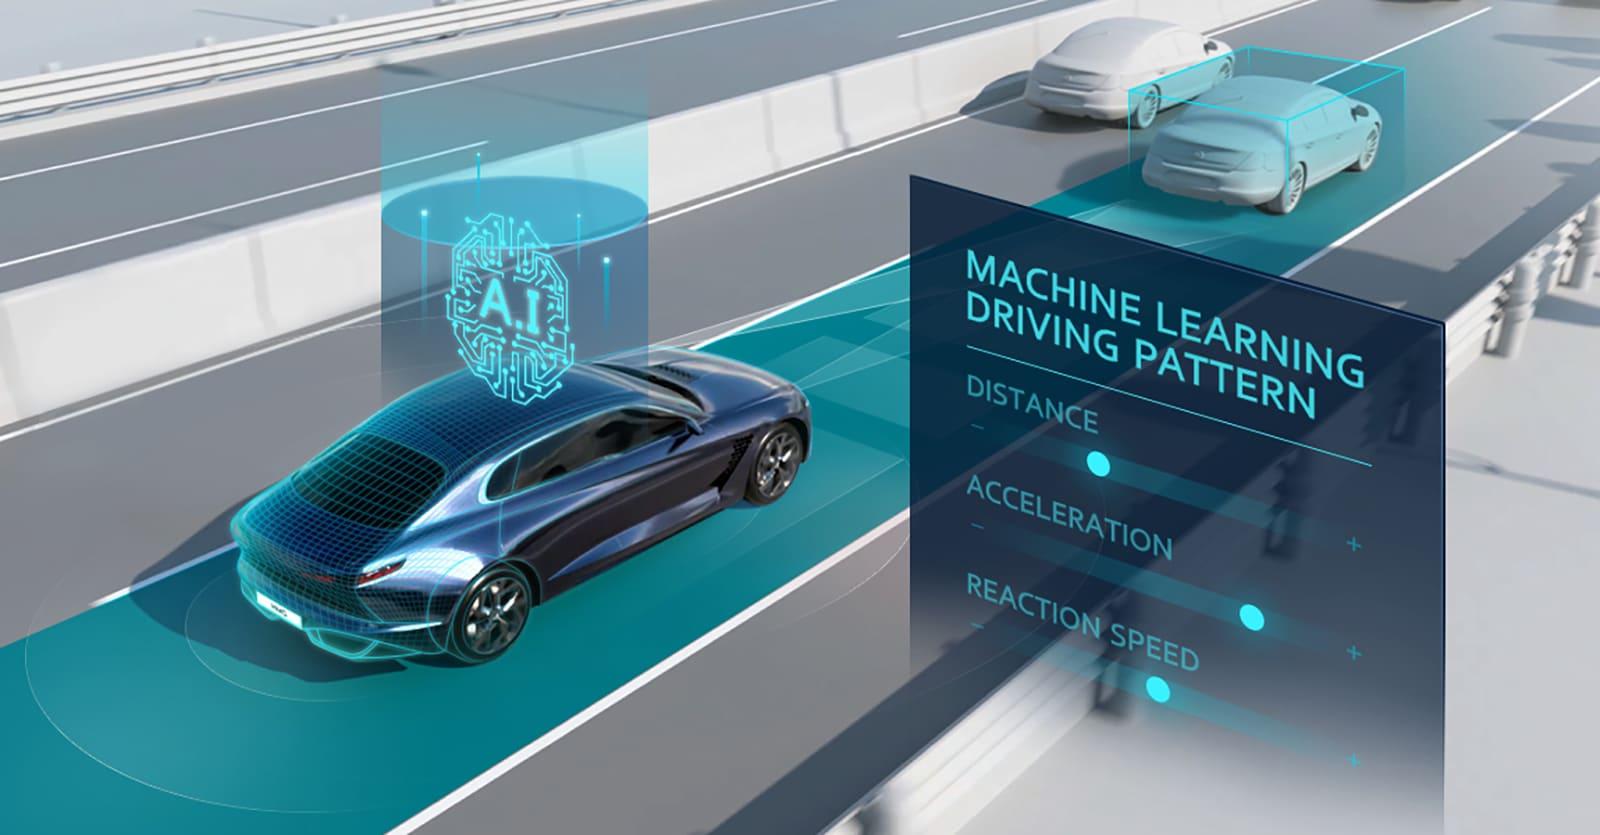 Hyundai Smart Cruise Control Machine Learning